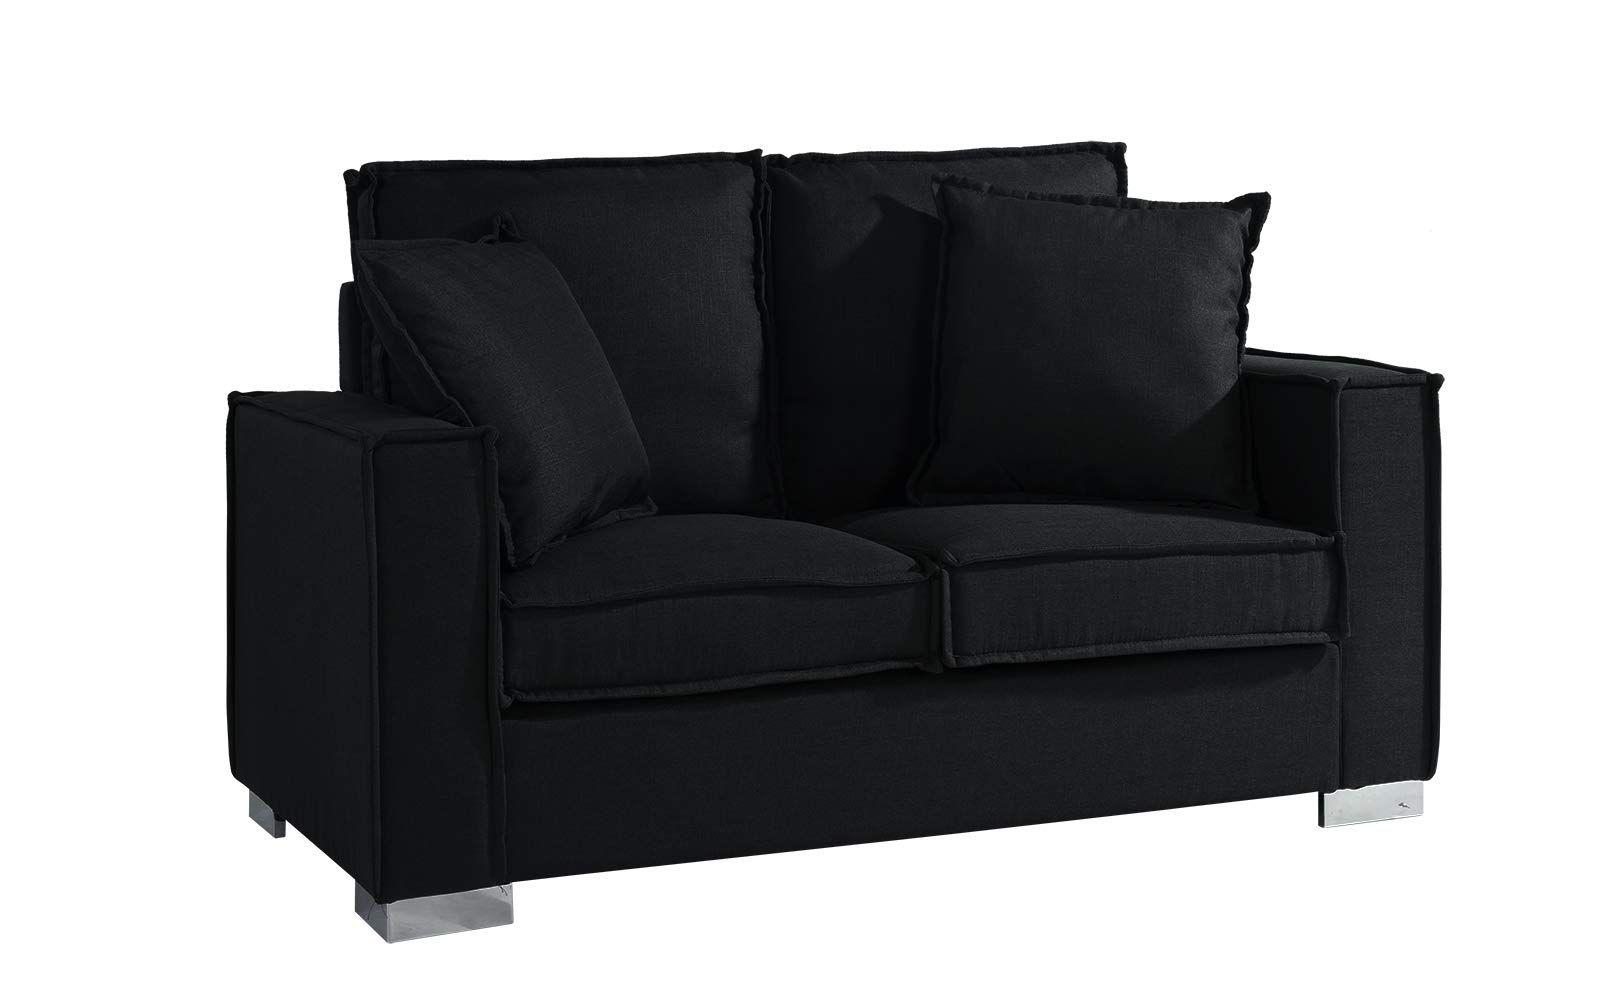 Classic Linen Fabric Sofa Small Space Loveseat Couch Black Love Seat Fabric Sofa Black Fabric Sofa